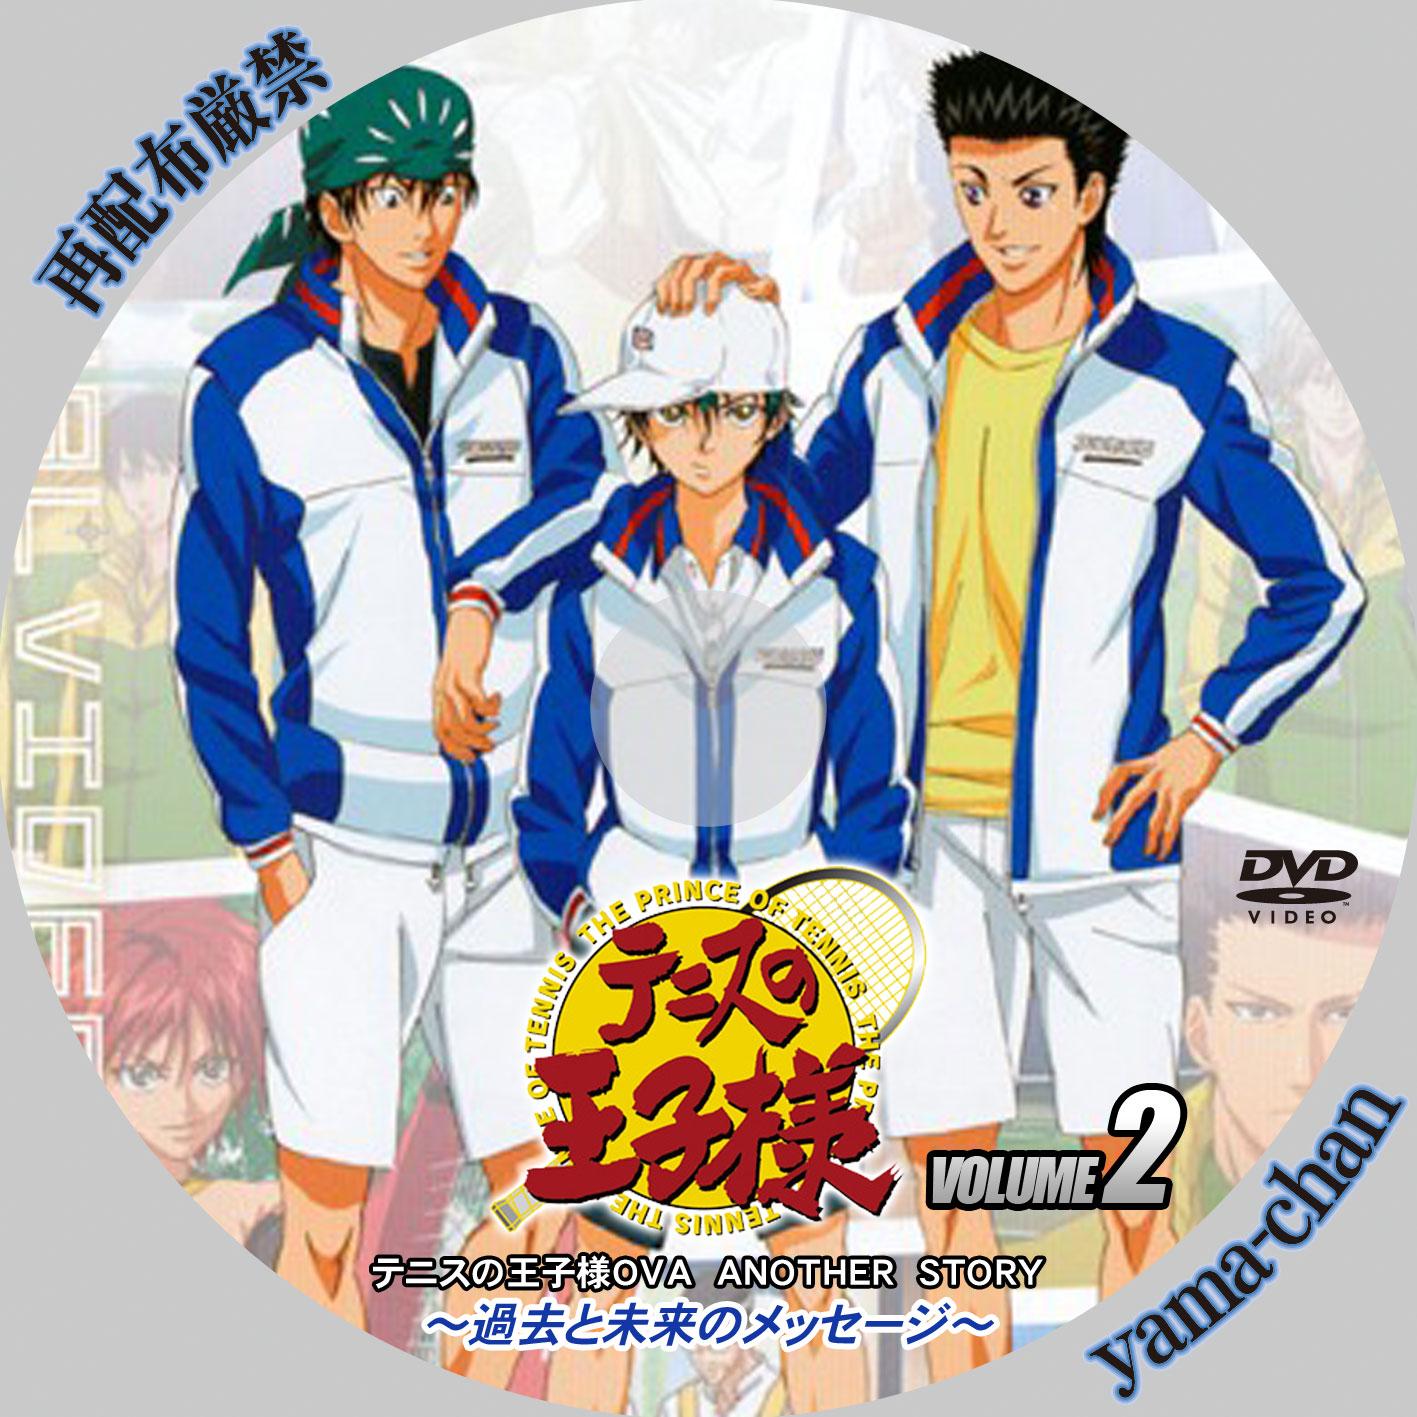 yama-chanのラベル工房 テニスの王子様/OVA ANOTHER STORY過去と未来の